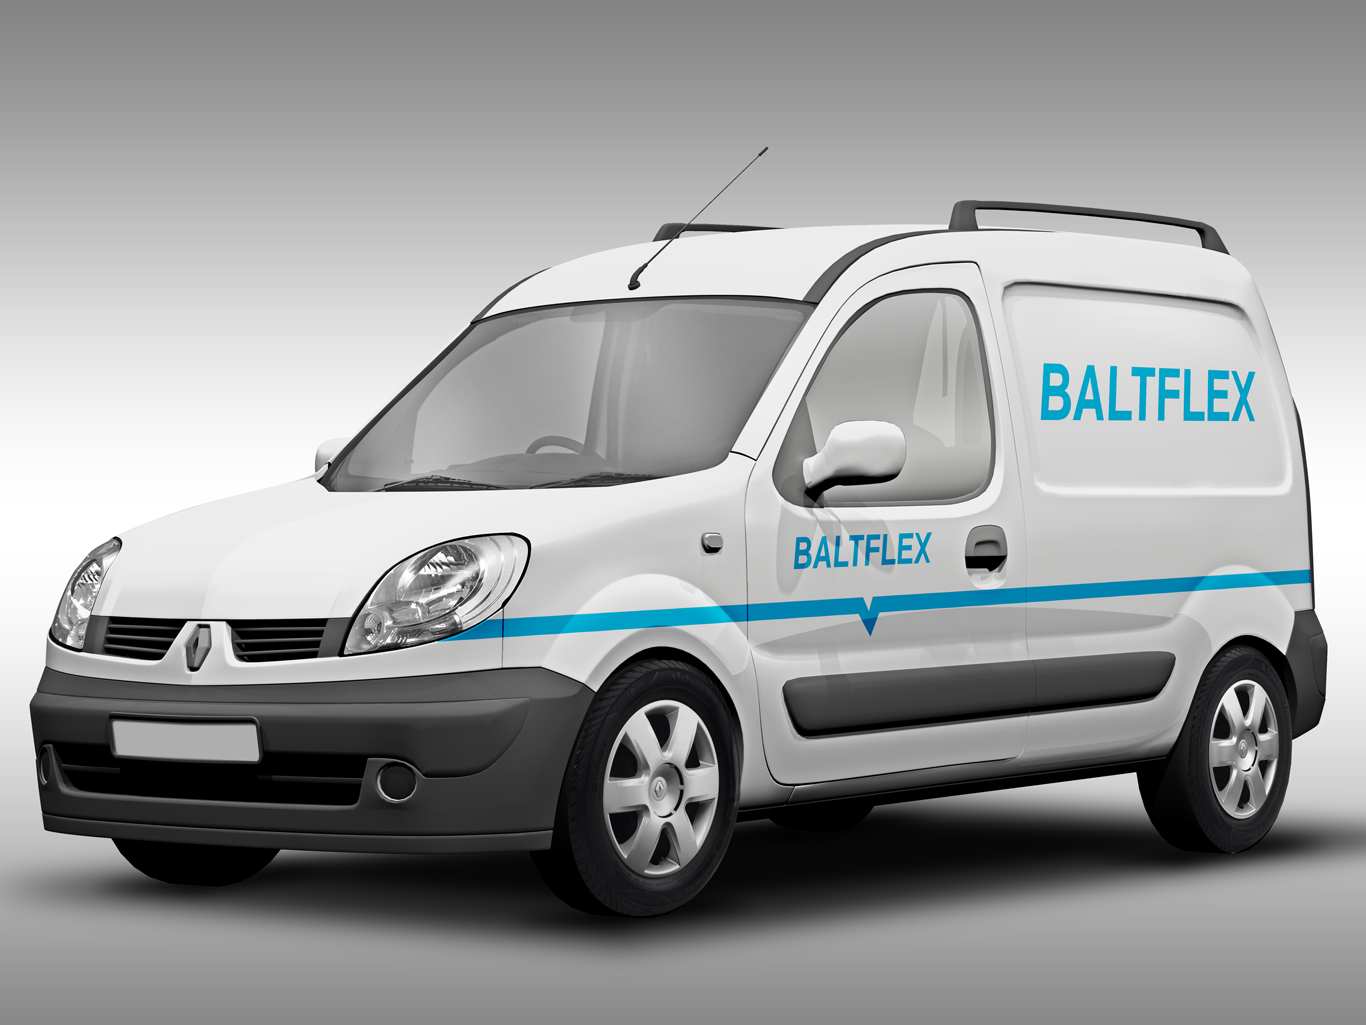 baltflex-GemGfx_Vehicle_Branding_Mockup